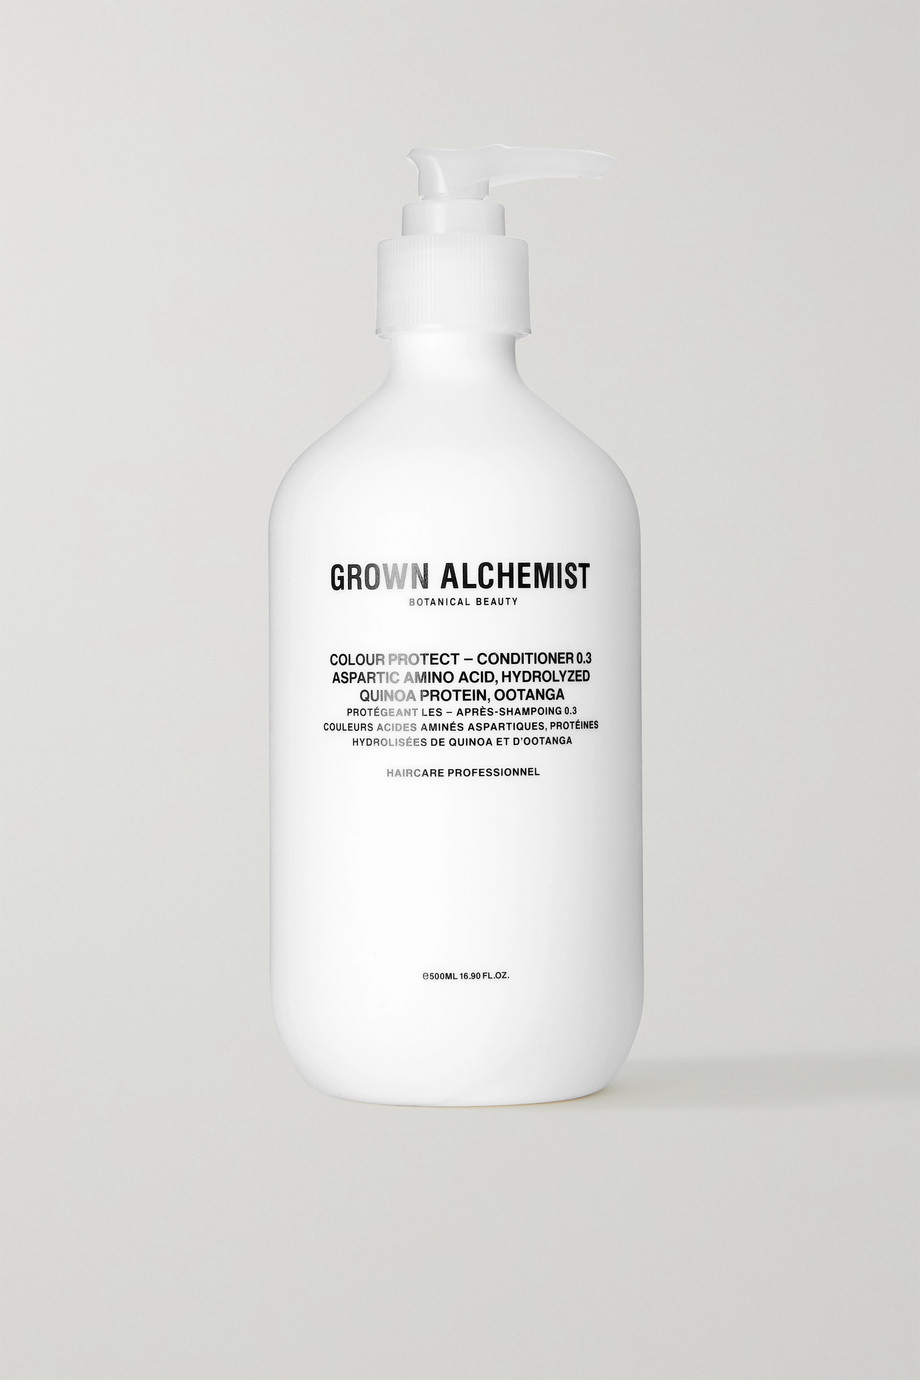 Grown Alchemist Colour Protect – Conditioner 0.3, 500 ml – Conditioner